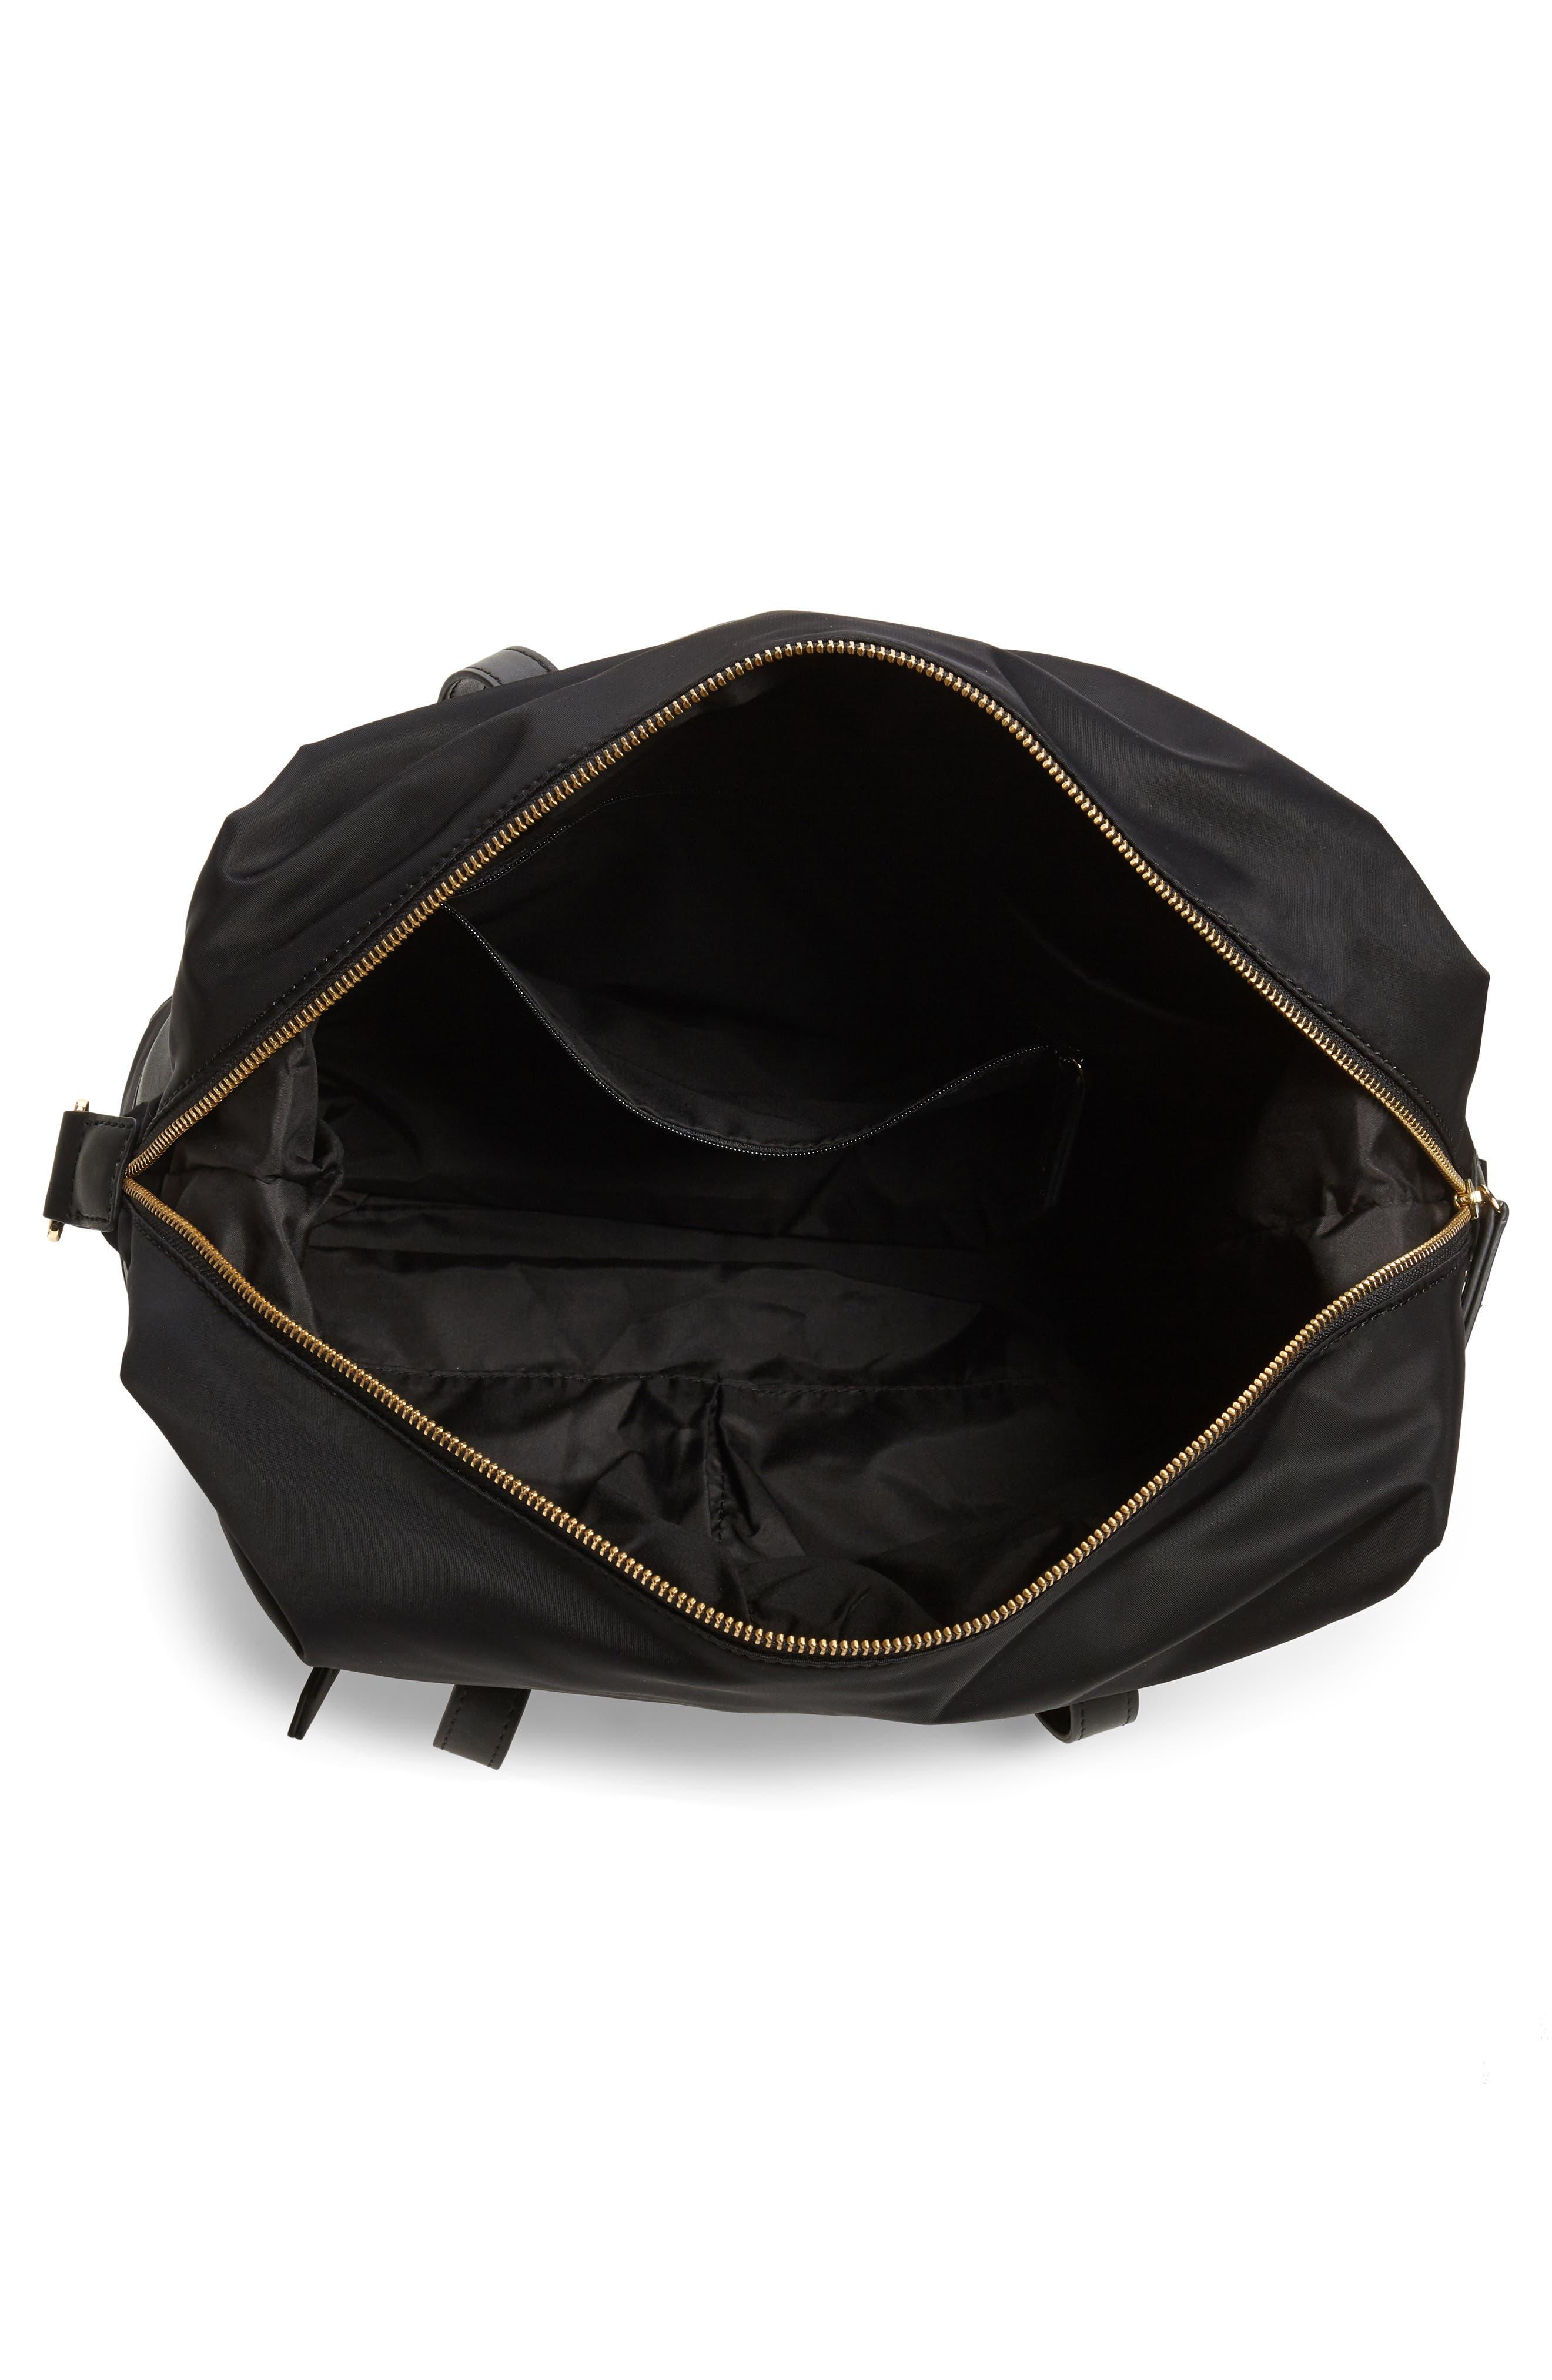 Nordstrom Rambler Expandable Nylon Duffle Bag